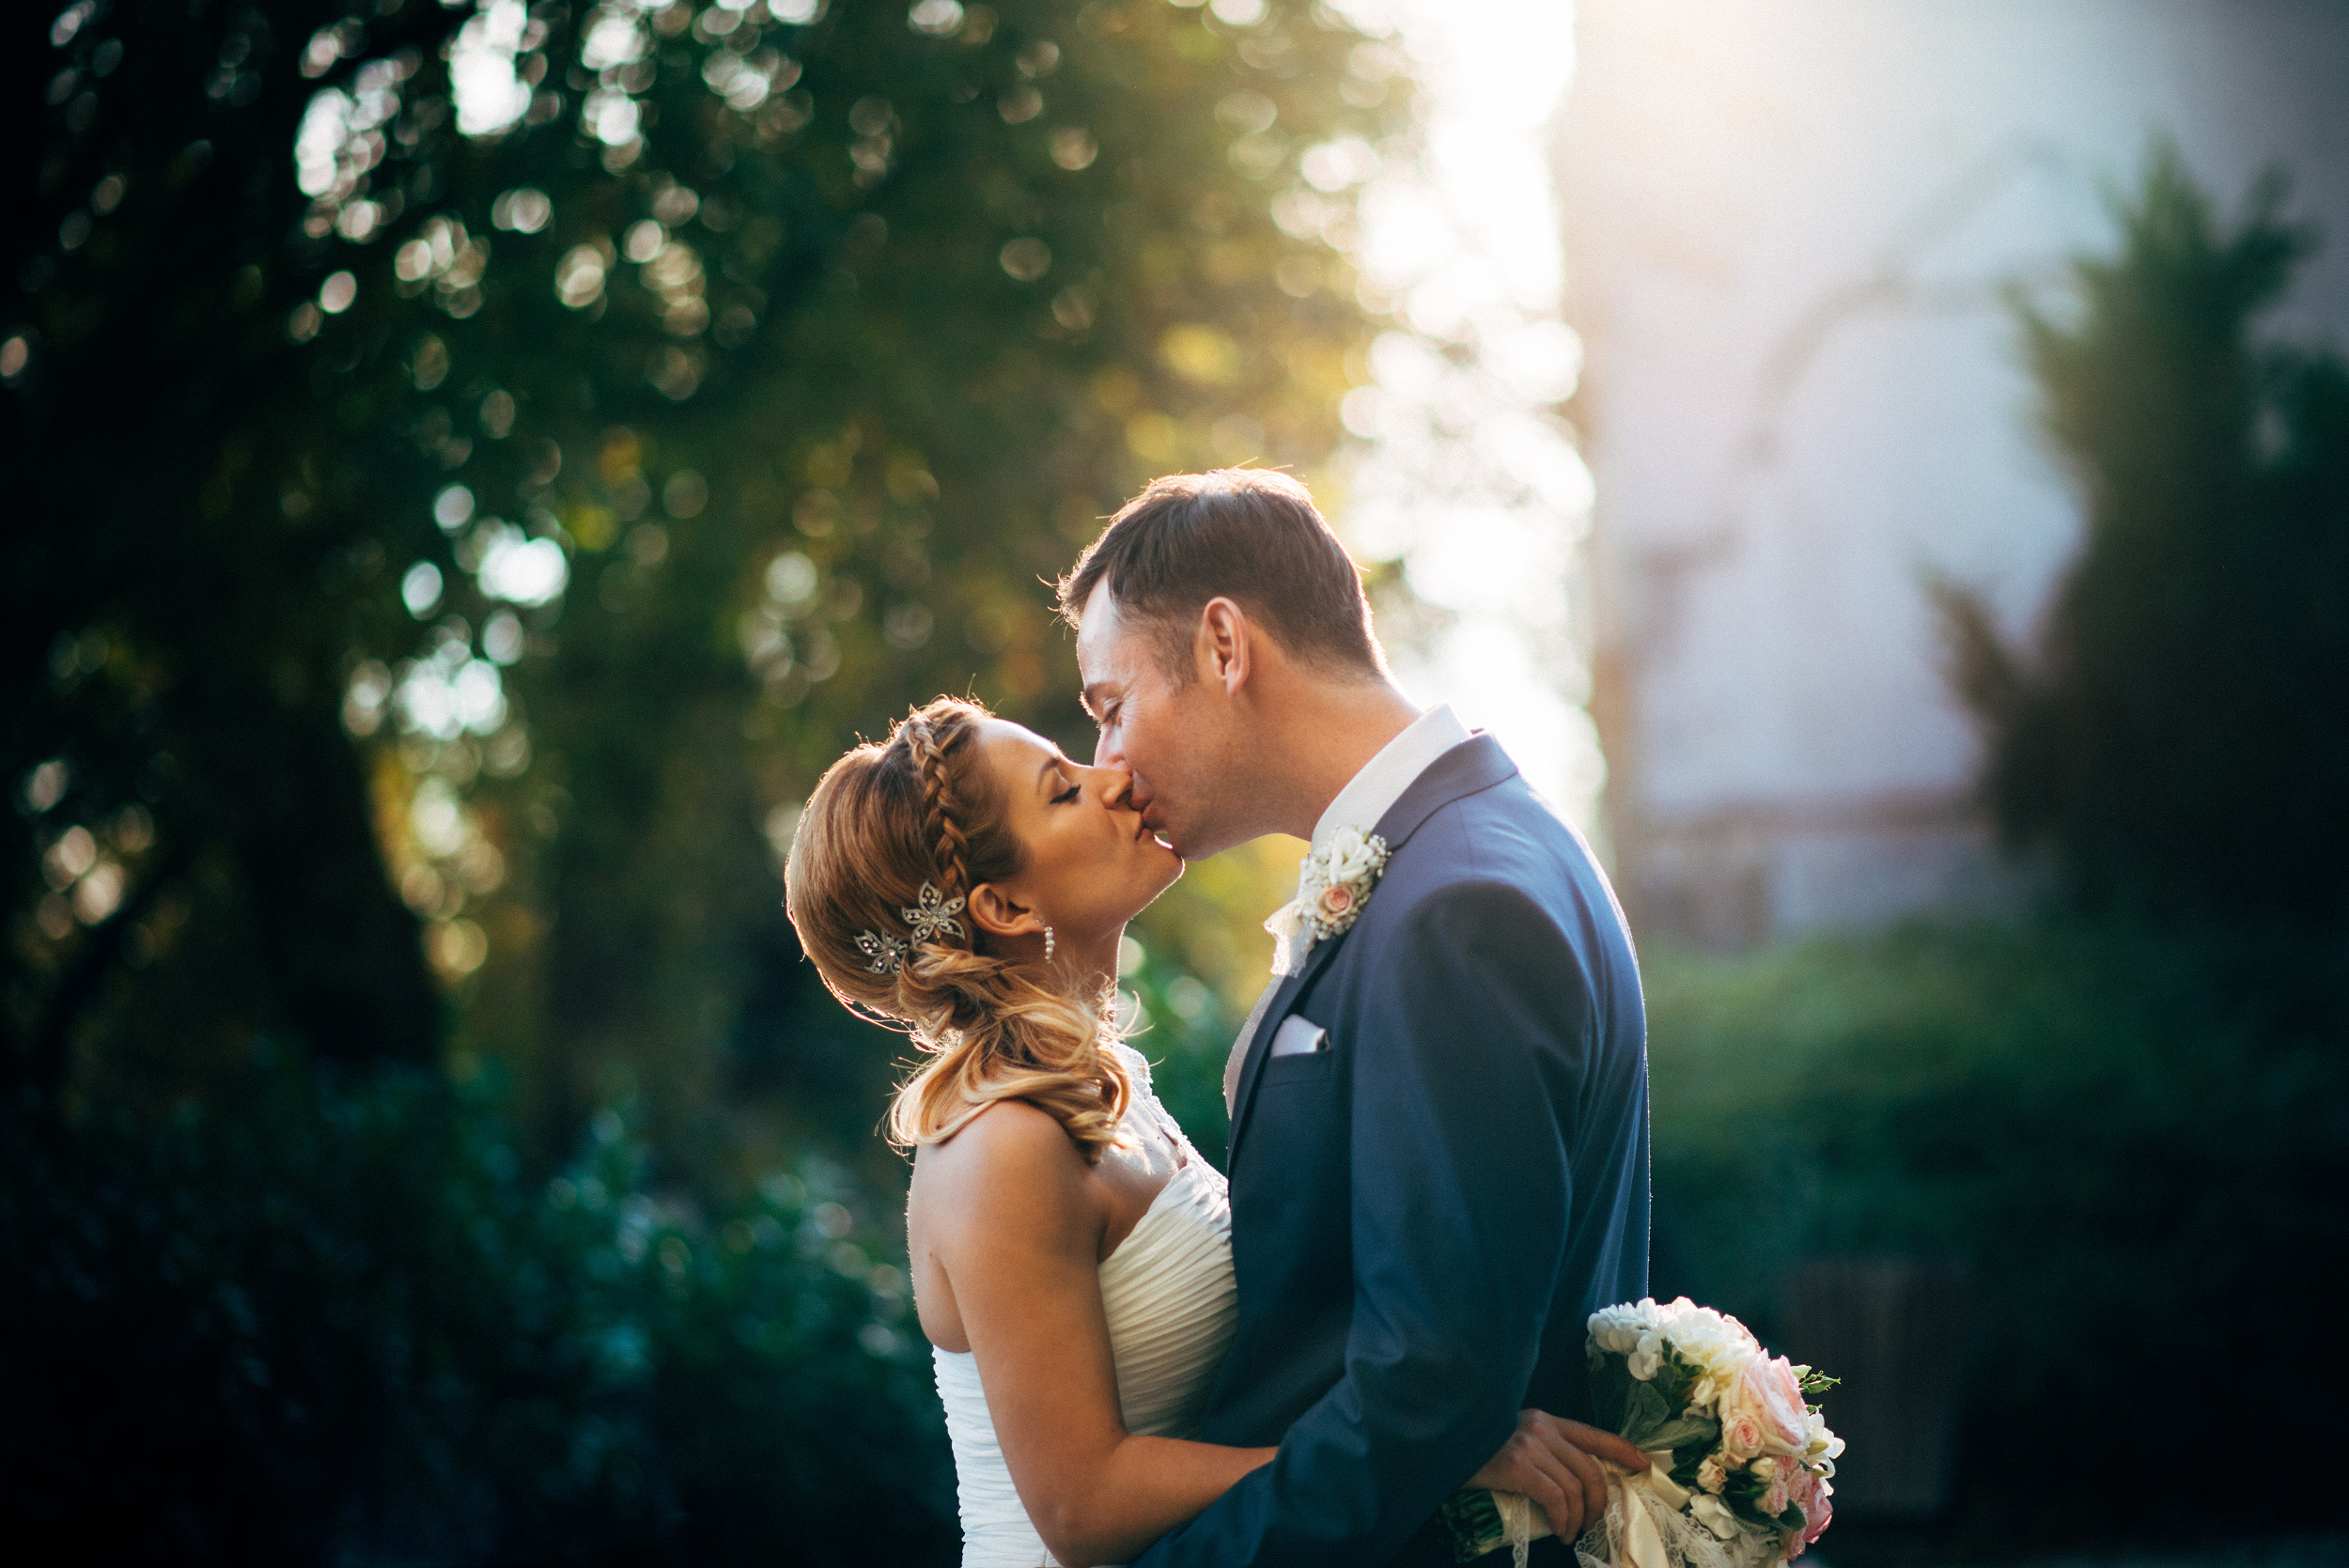 David Scholes Lancashire wedding photography 2016-59.jpg